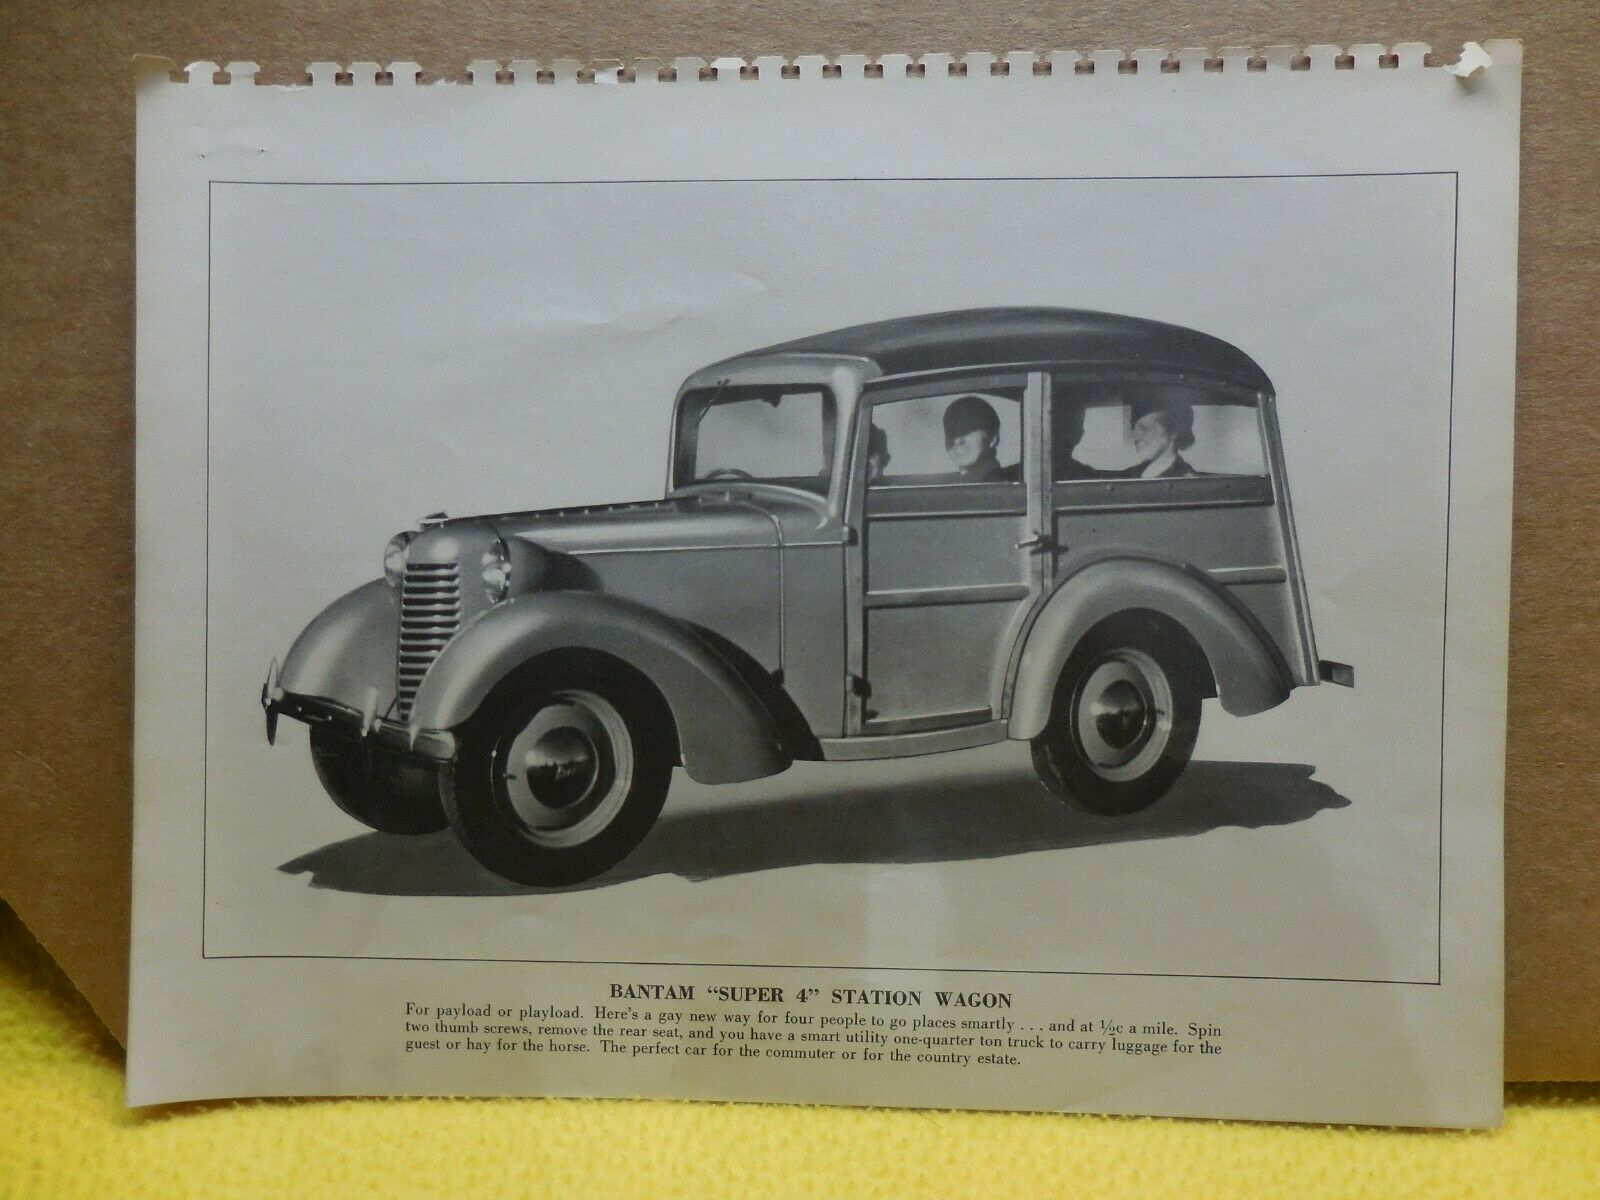 1940 Bantam Station Wagon Factory Photo